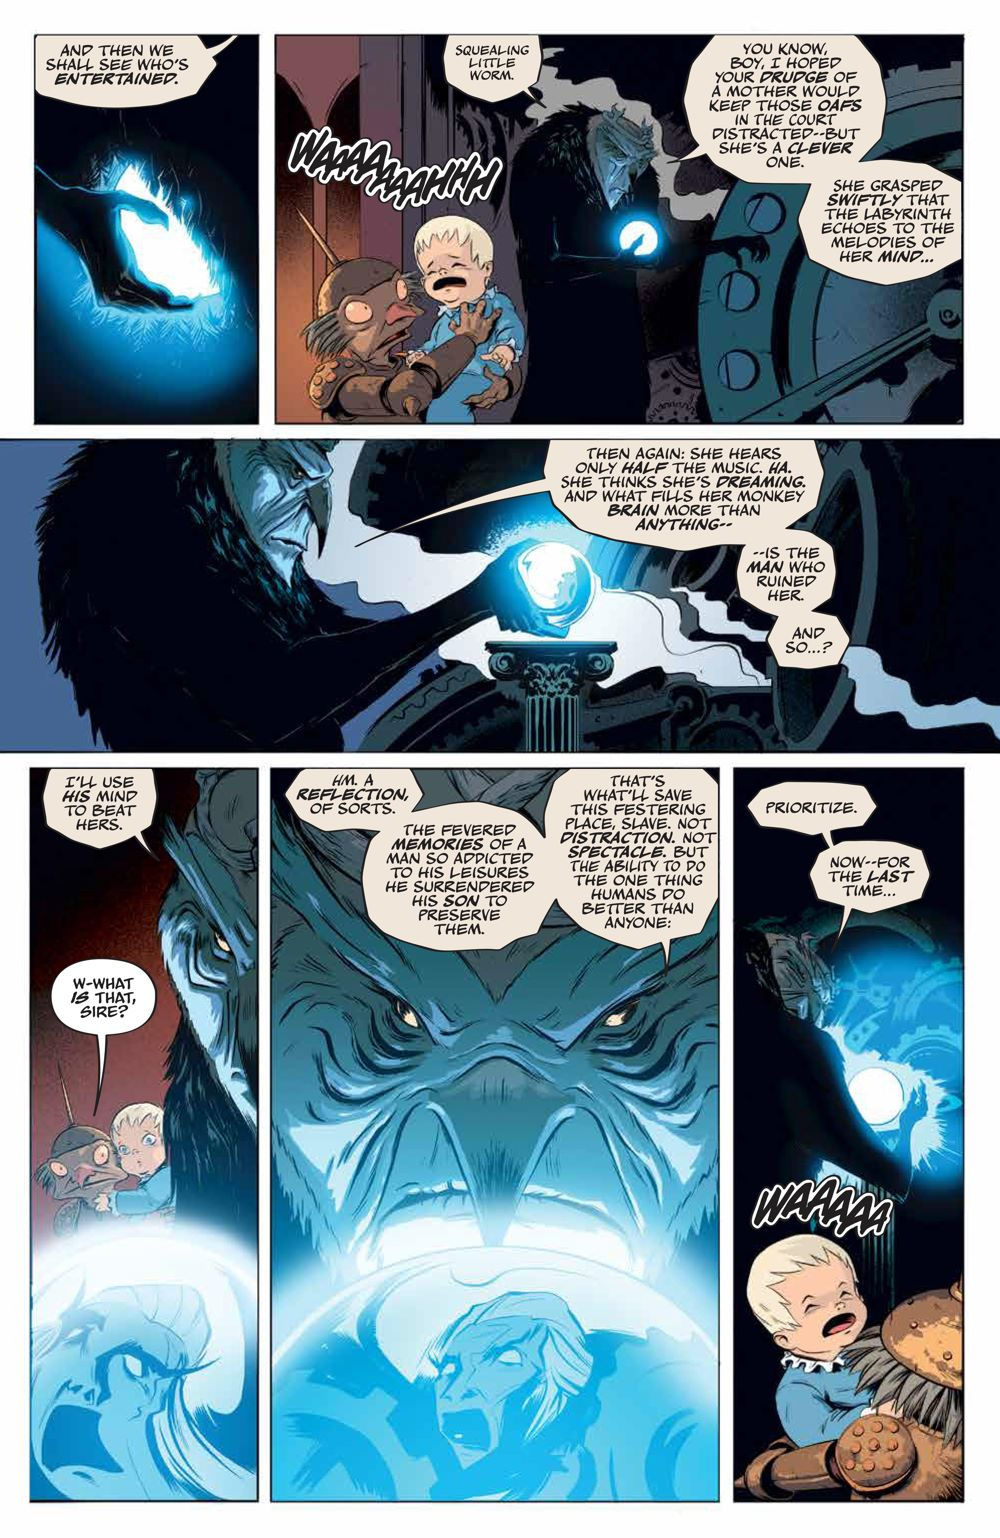 LabyrinthCoronation_v2_SC_PRESS_13 ComicList Previews: JIM HENSON'S LABYRINTH CORONATION VOLUME 2 TP